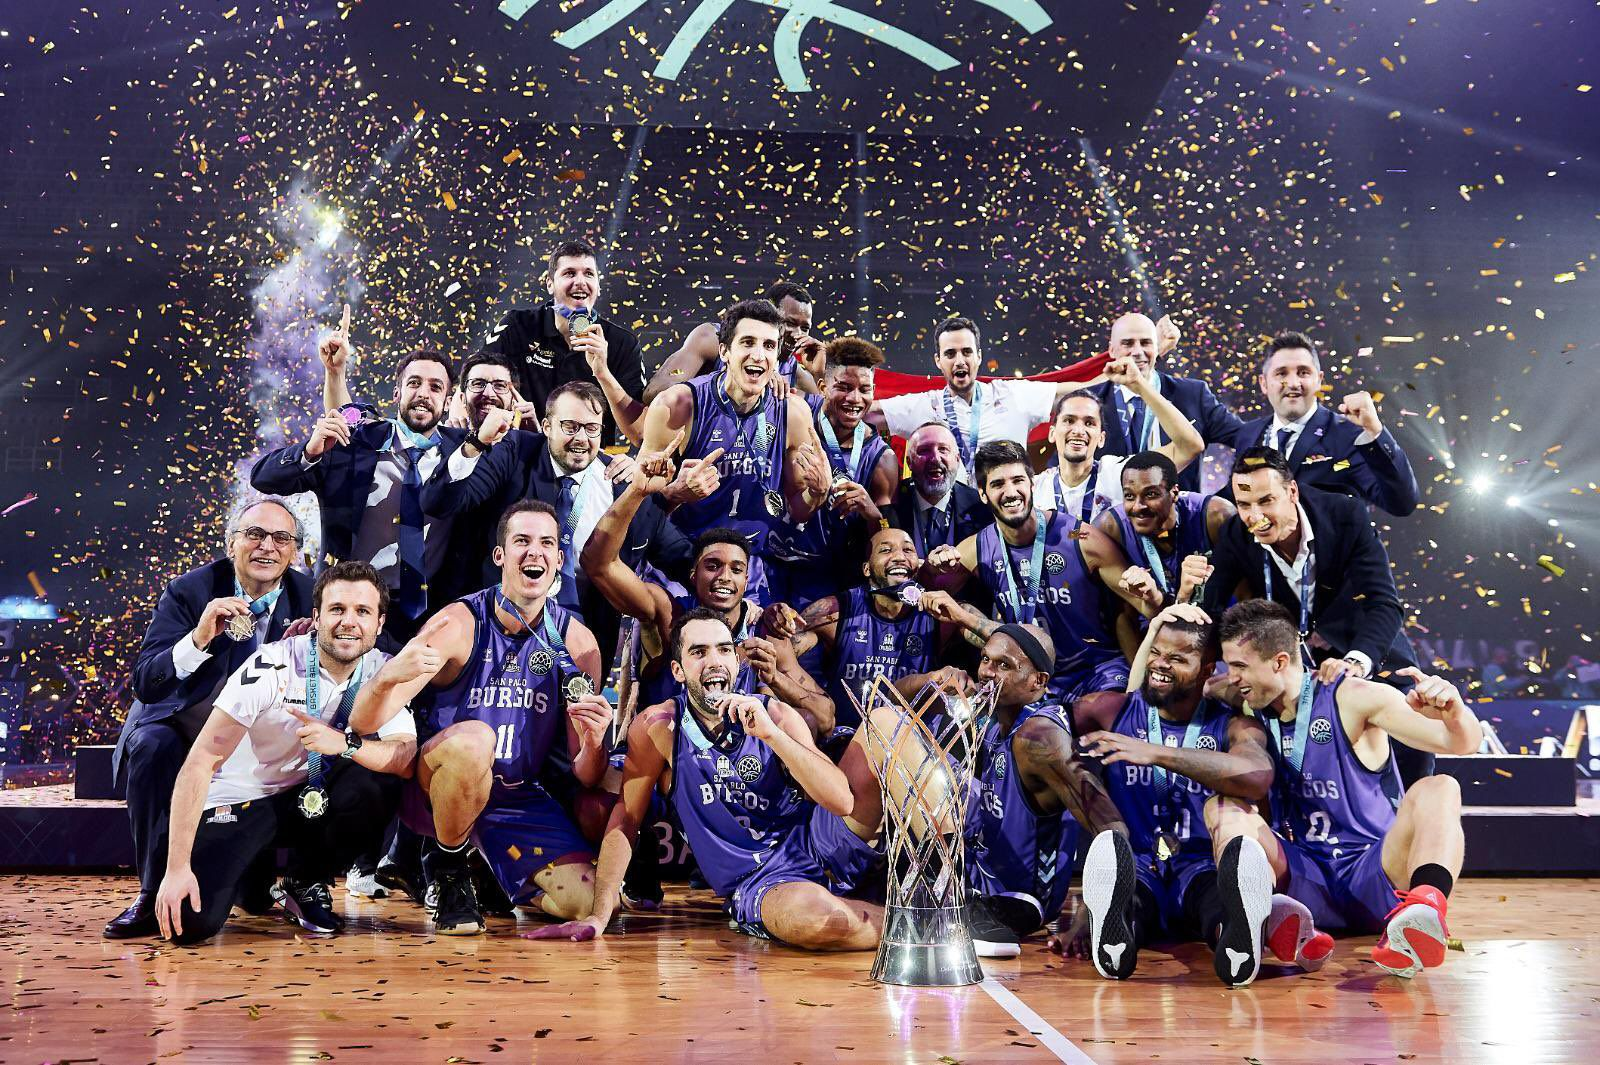 Hereda San Pablo Burgos remporte la Basketball Champions League 2020